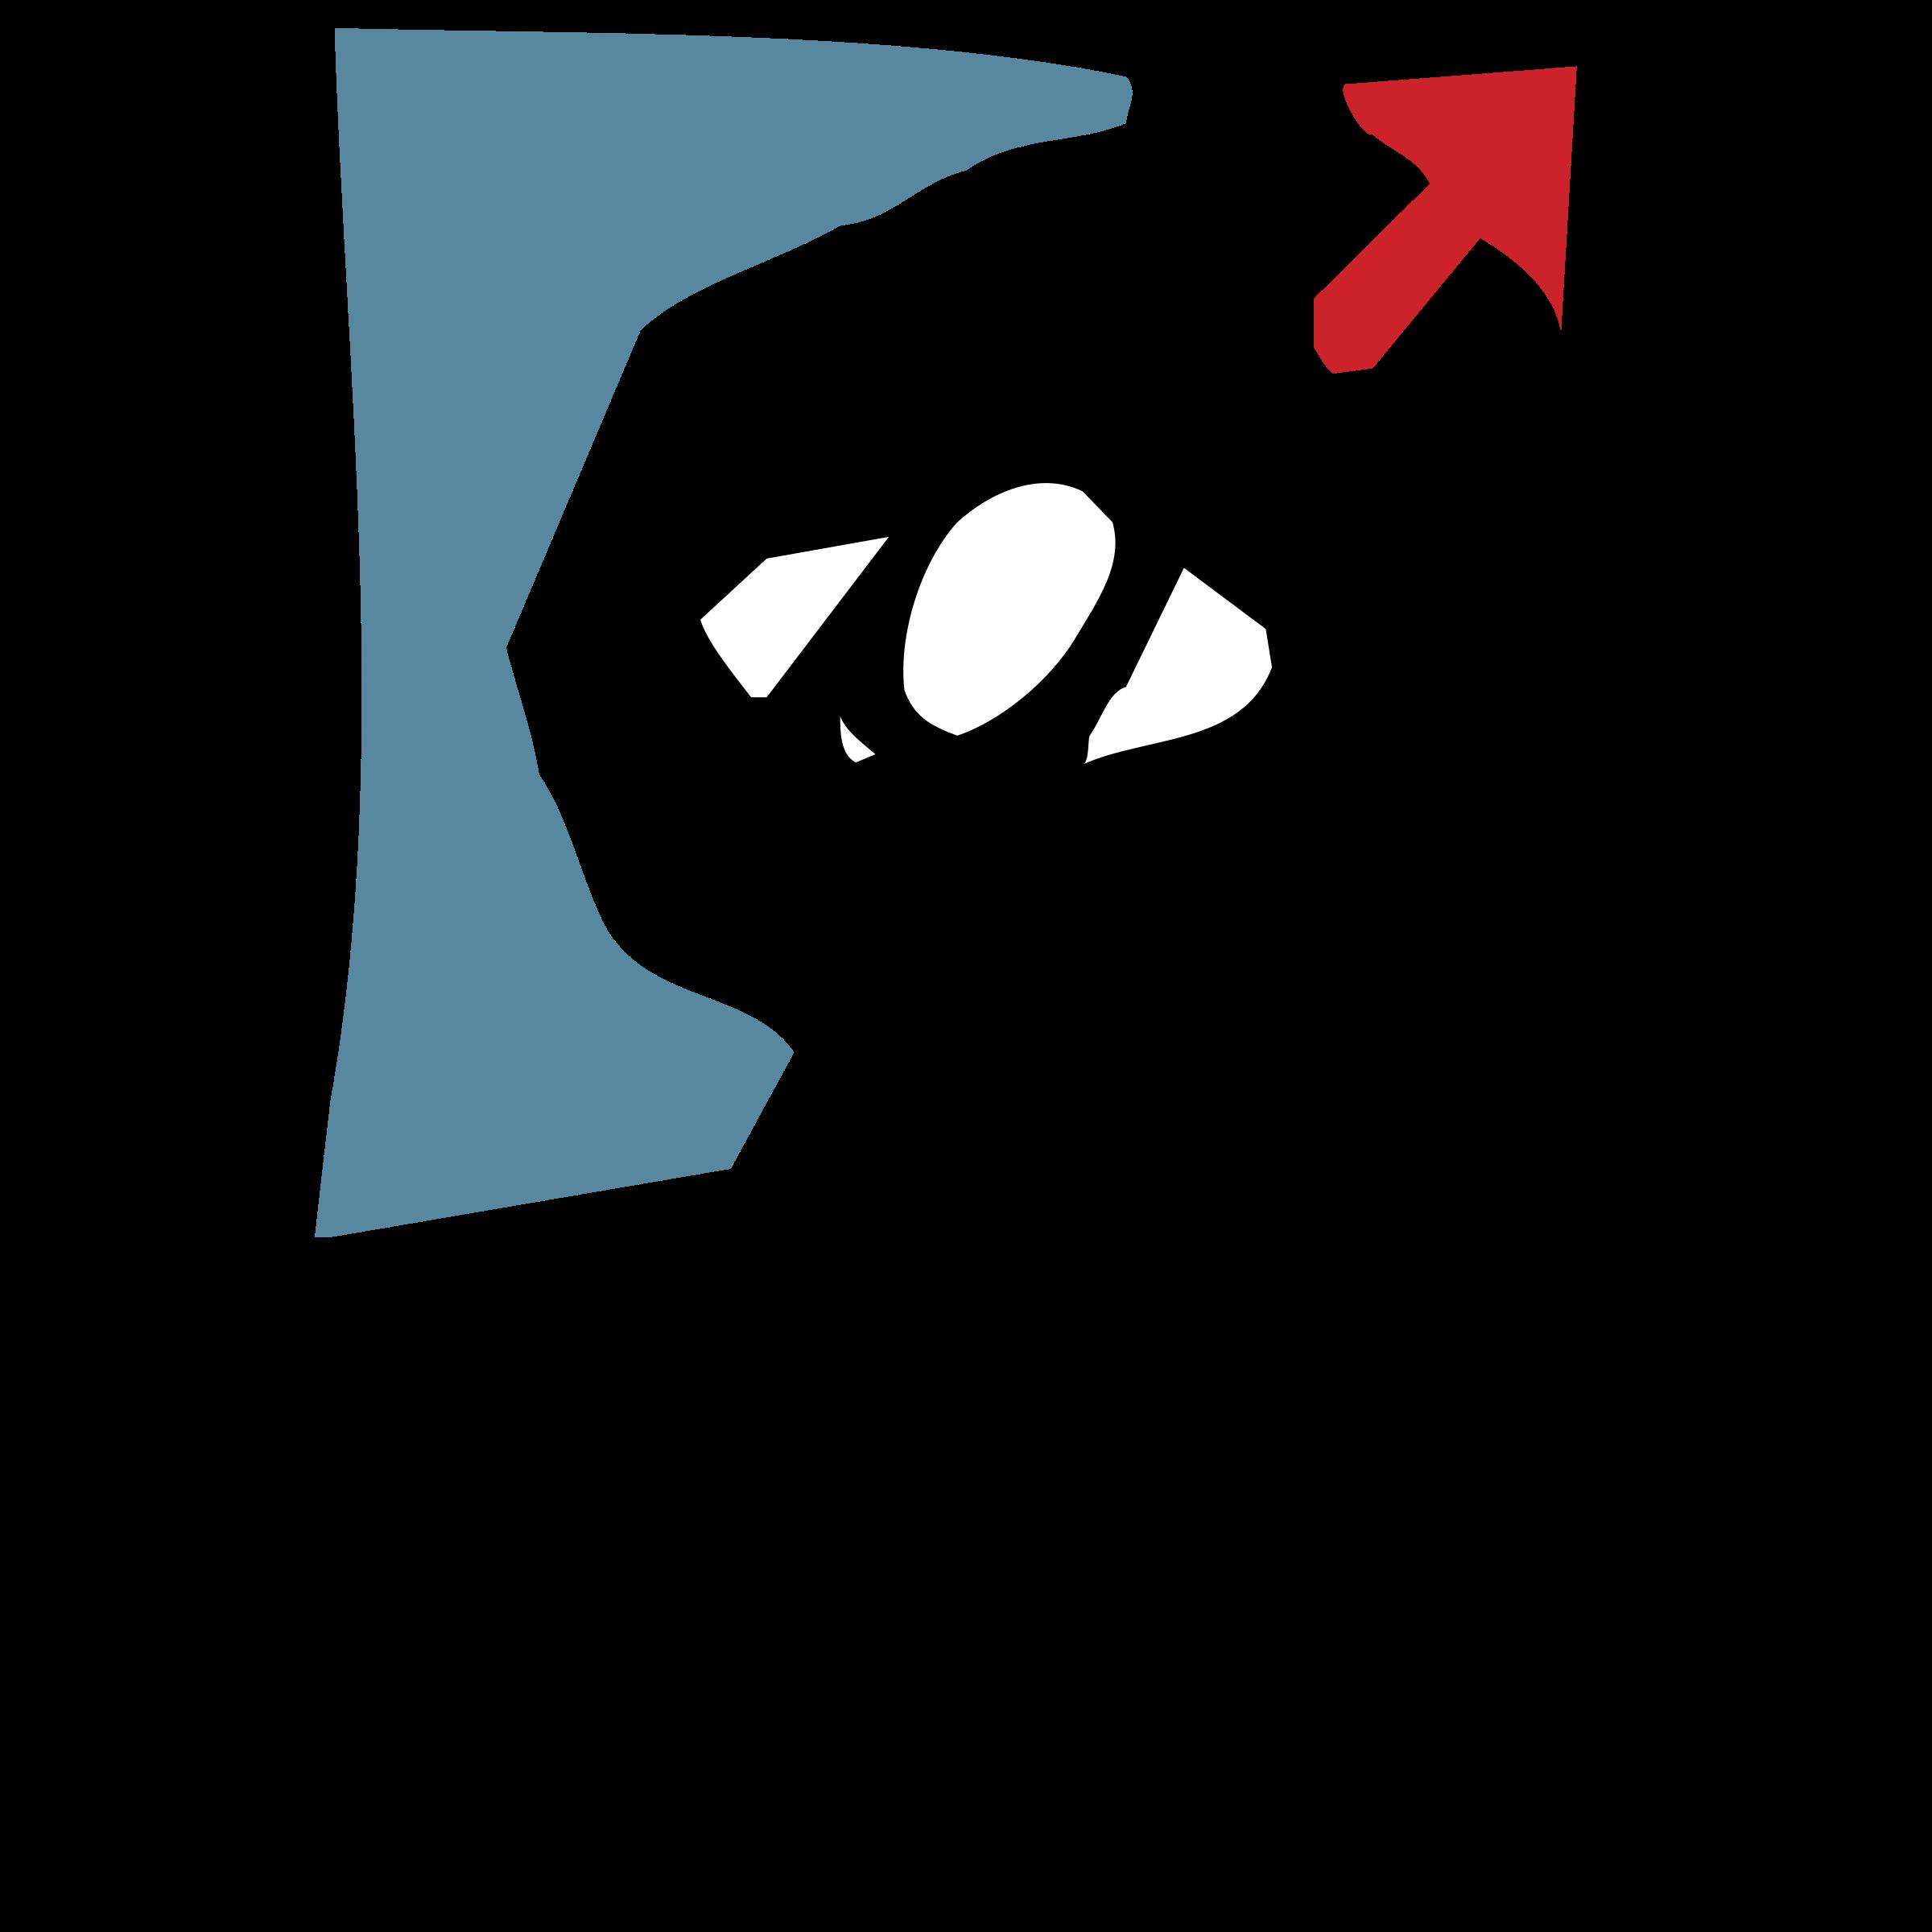 Logitech Logo Png Transparent Svg Vector Freebie Supply